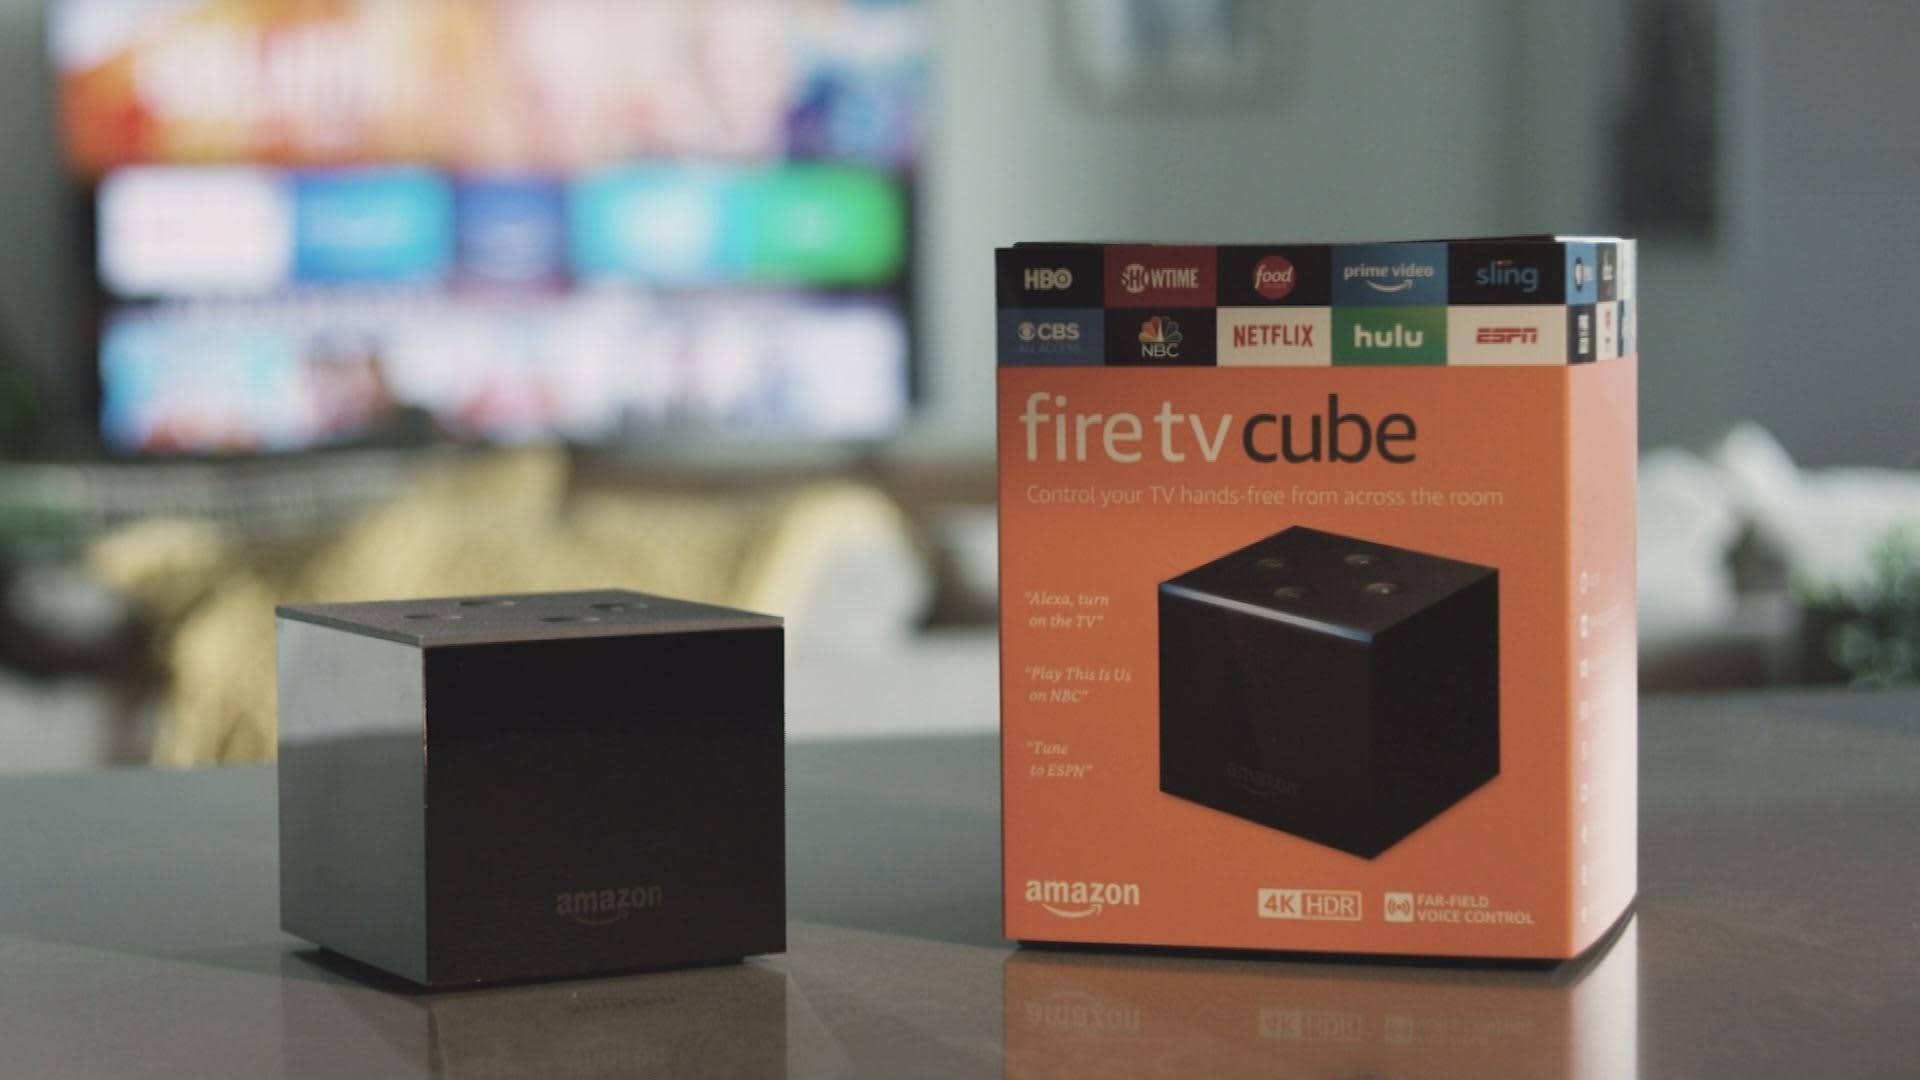 Amazon unveils Fire TV Cube